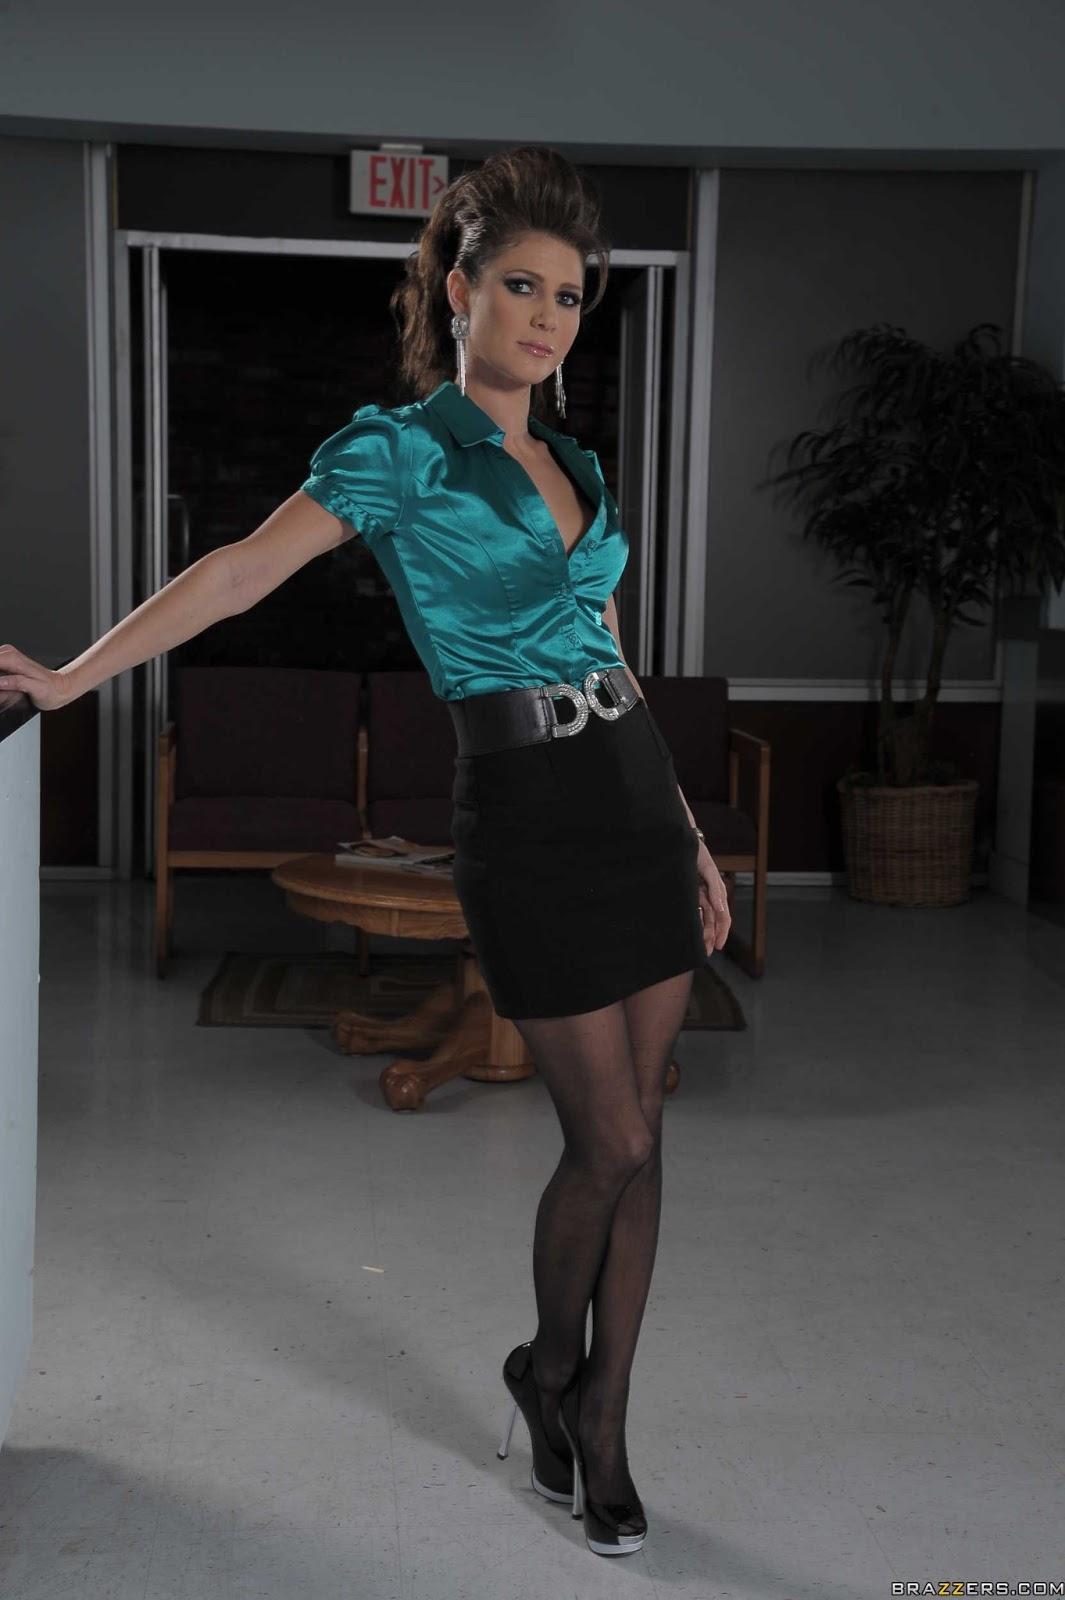 Порно фото юбки и блузки — photo 10